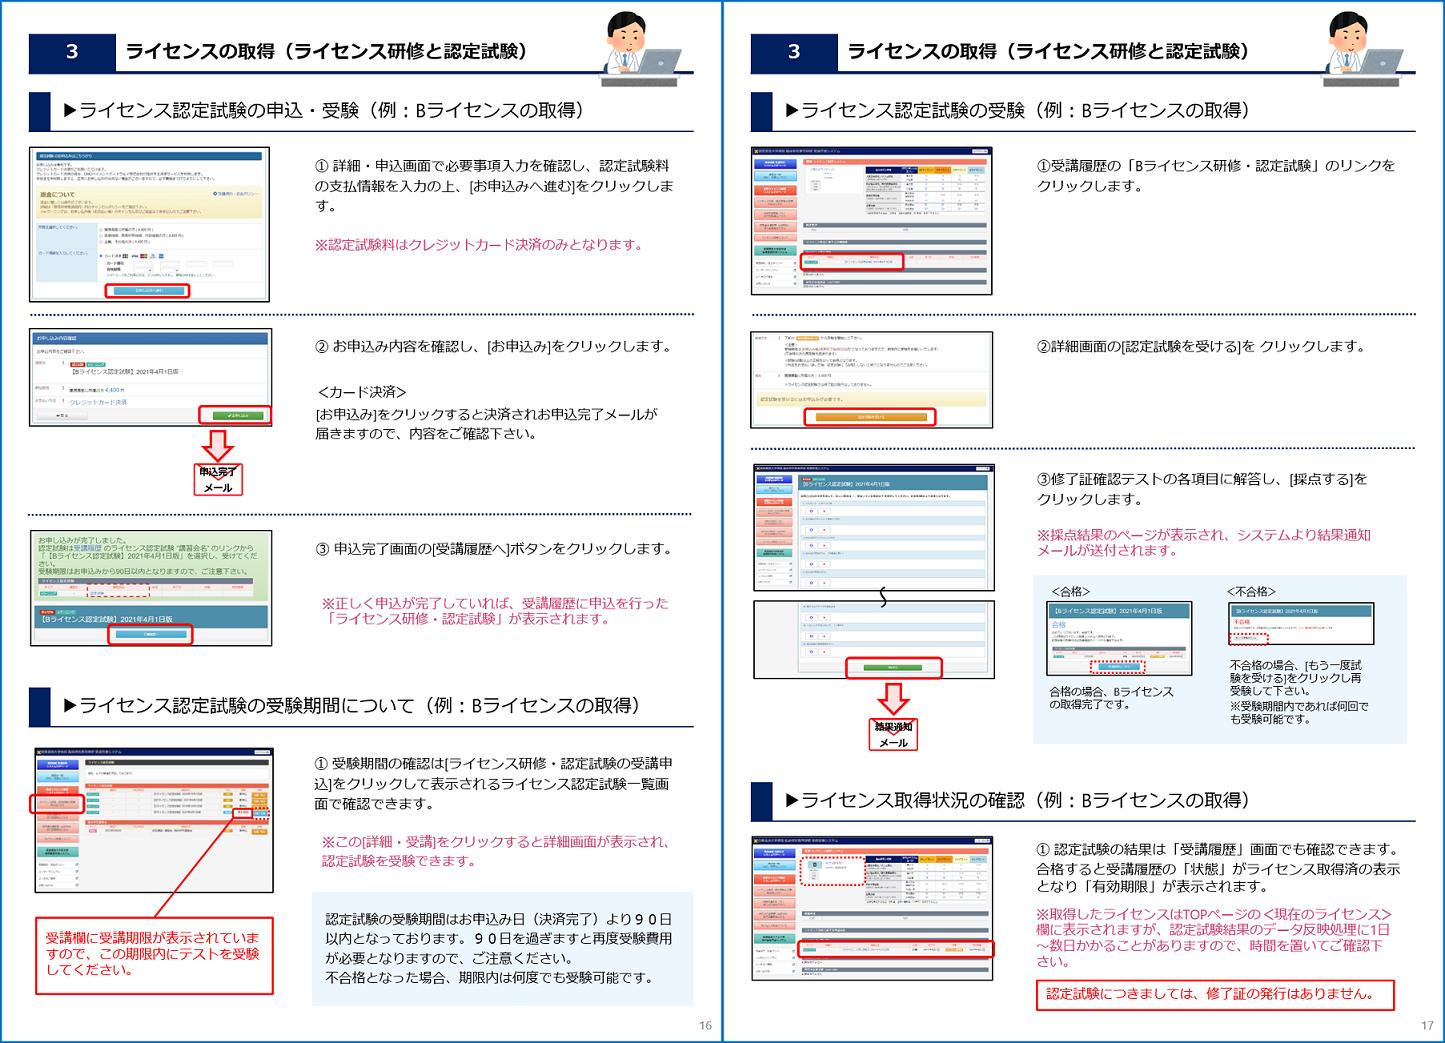 https://www.ctr.hosp.keio.ac.jp/news/UsersGuide_v5_p16-17.png